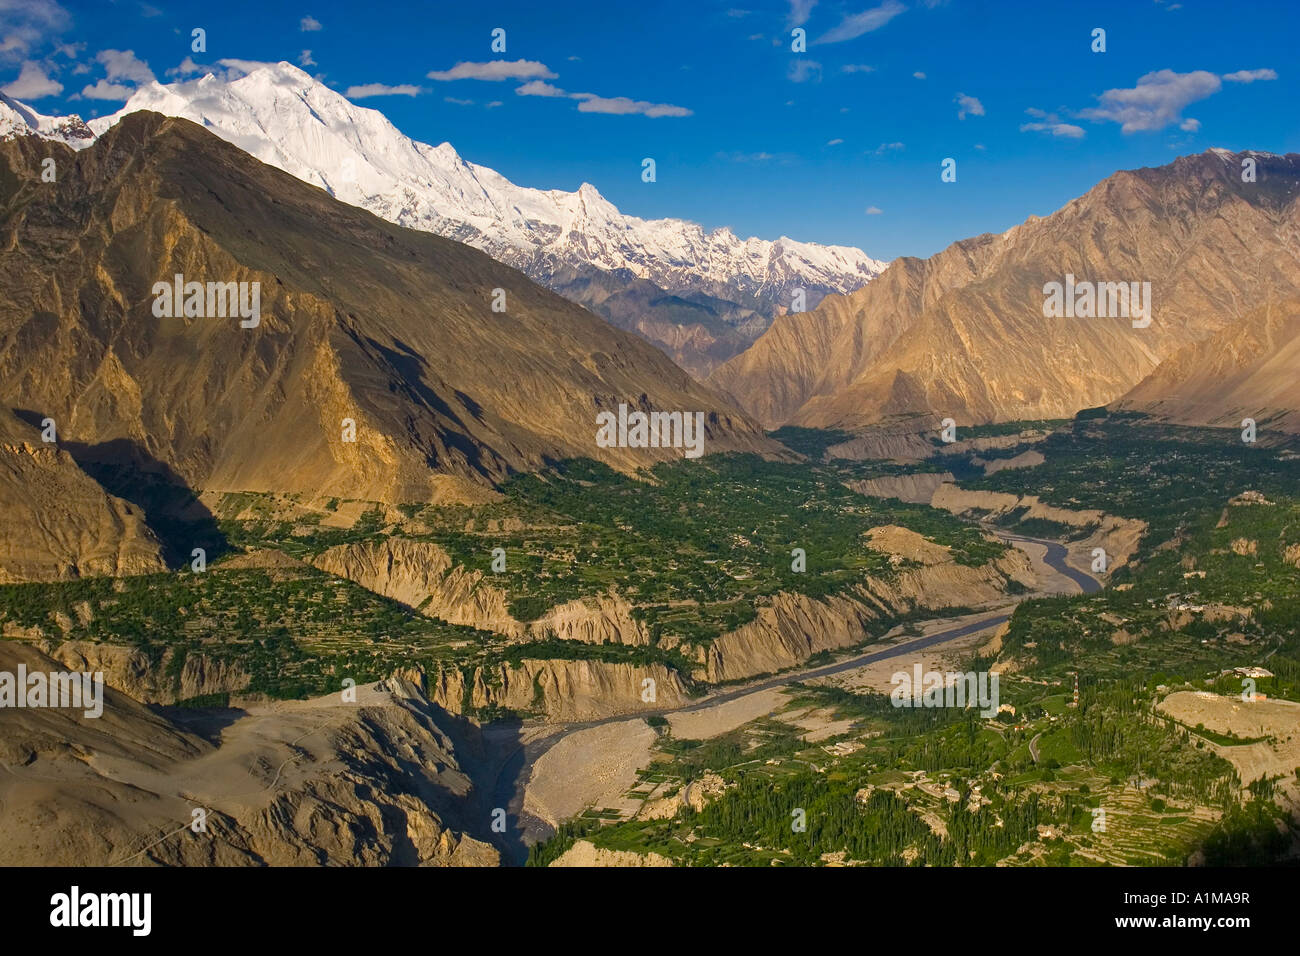 Karimabad, Hunza Valley, Karakoram, Pakistan - Stock Image